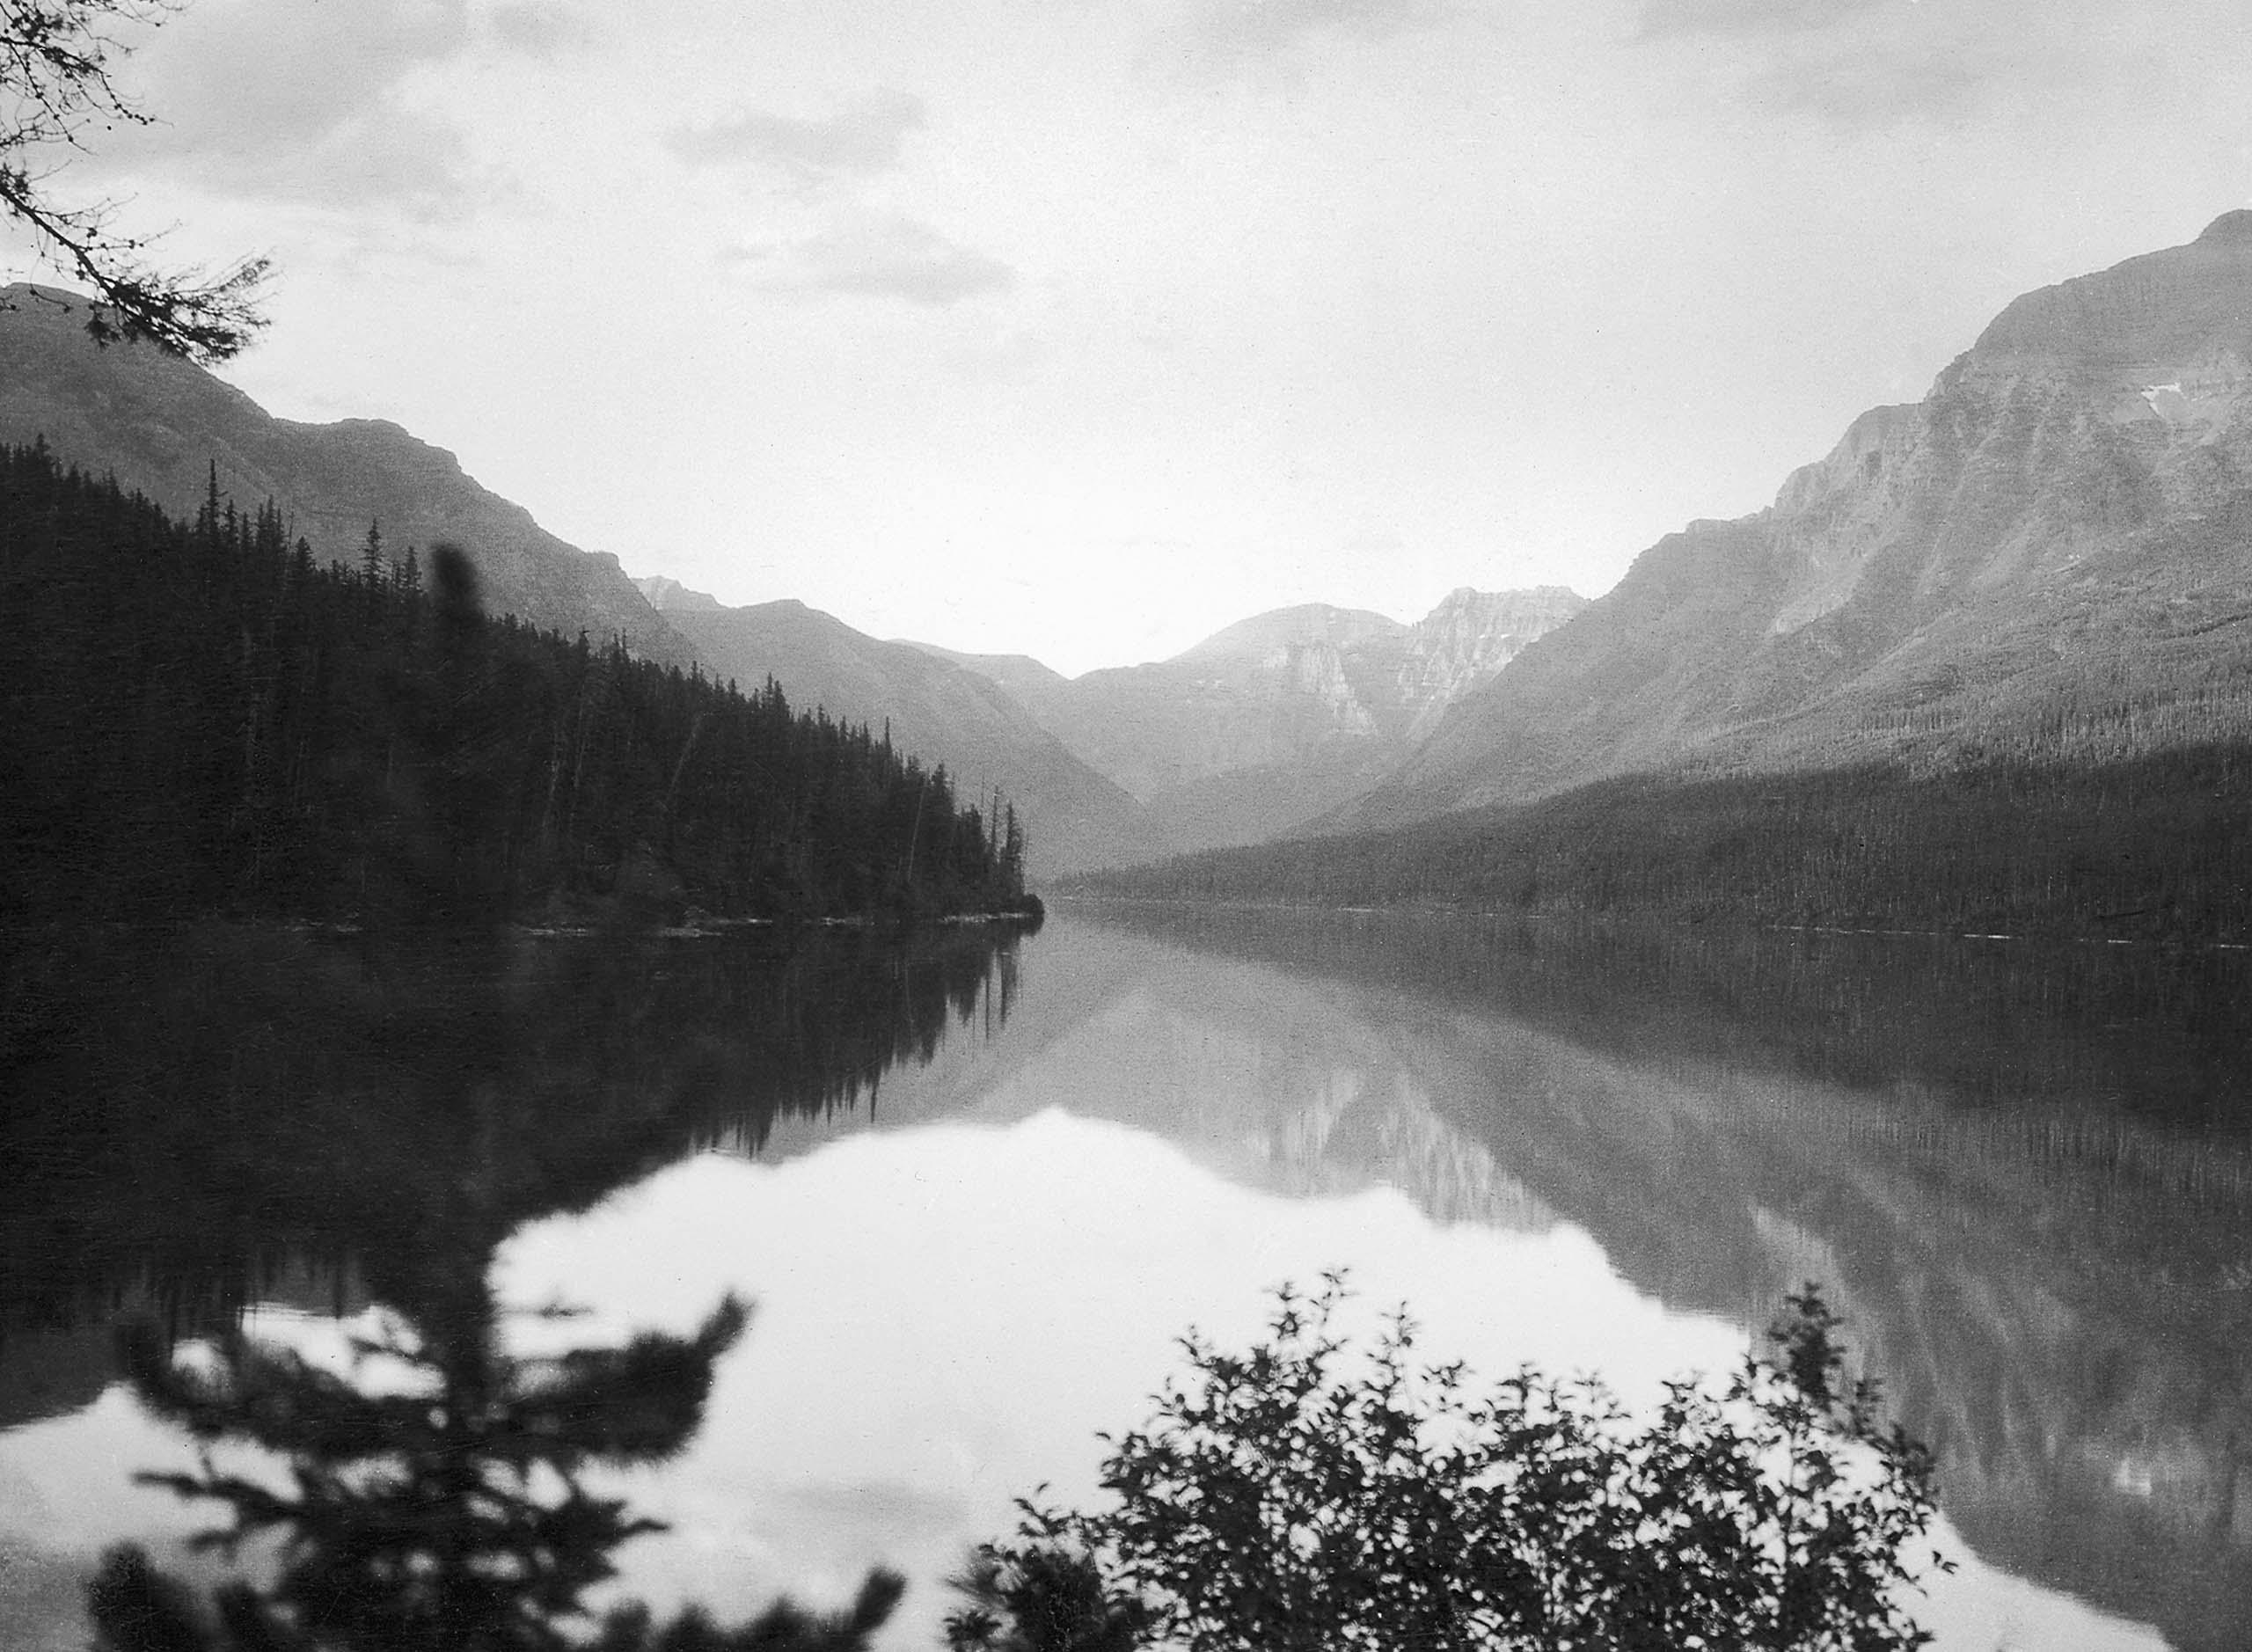 Bowman Lake, Flathead County, Mo., 1913.